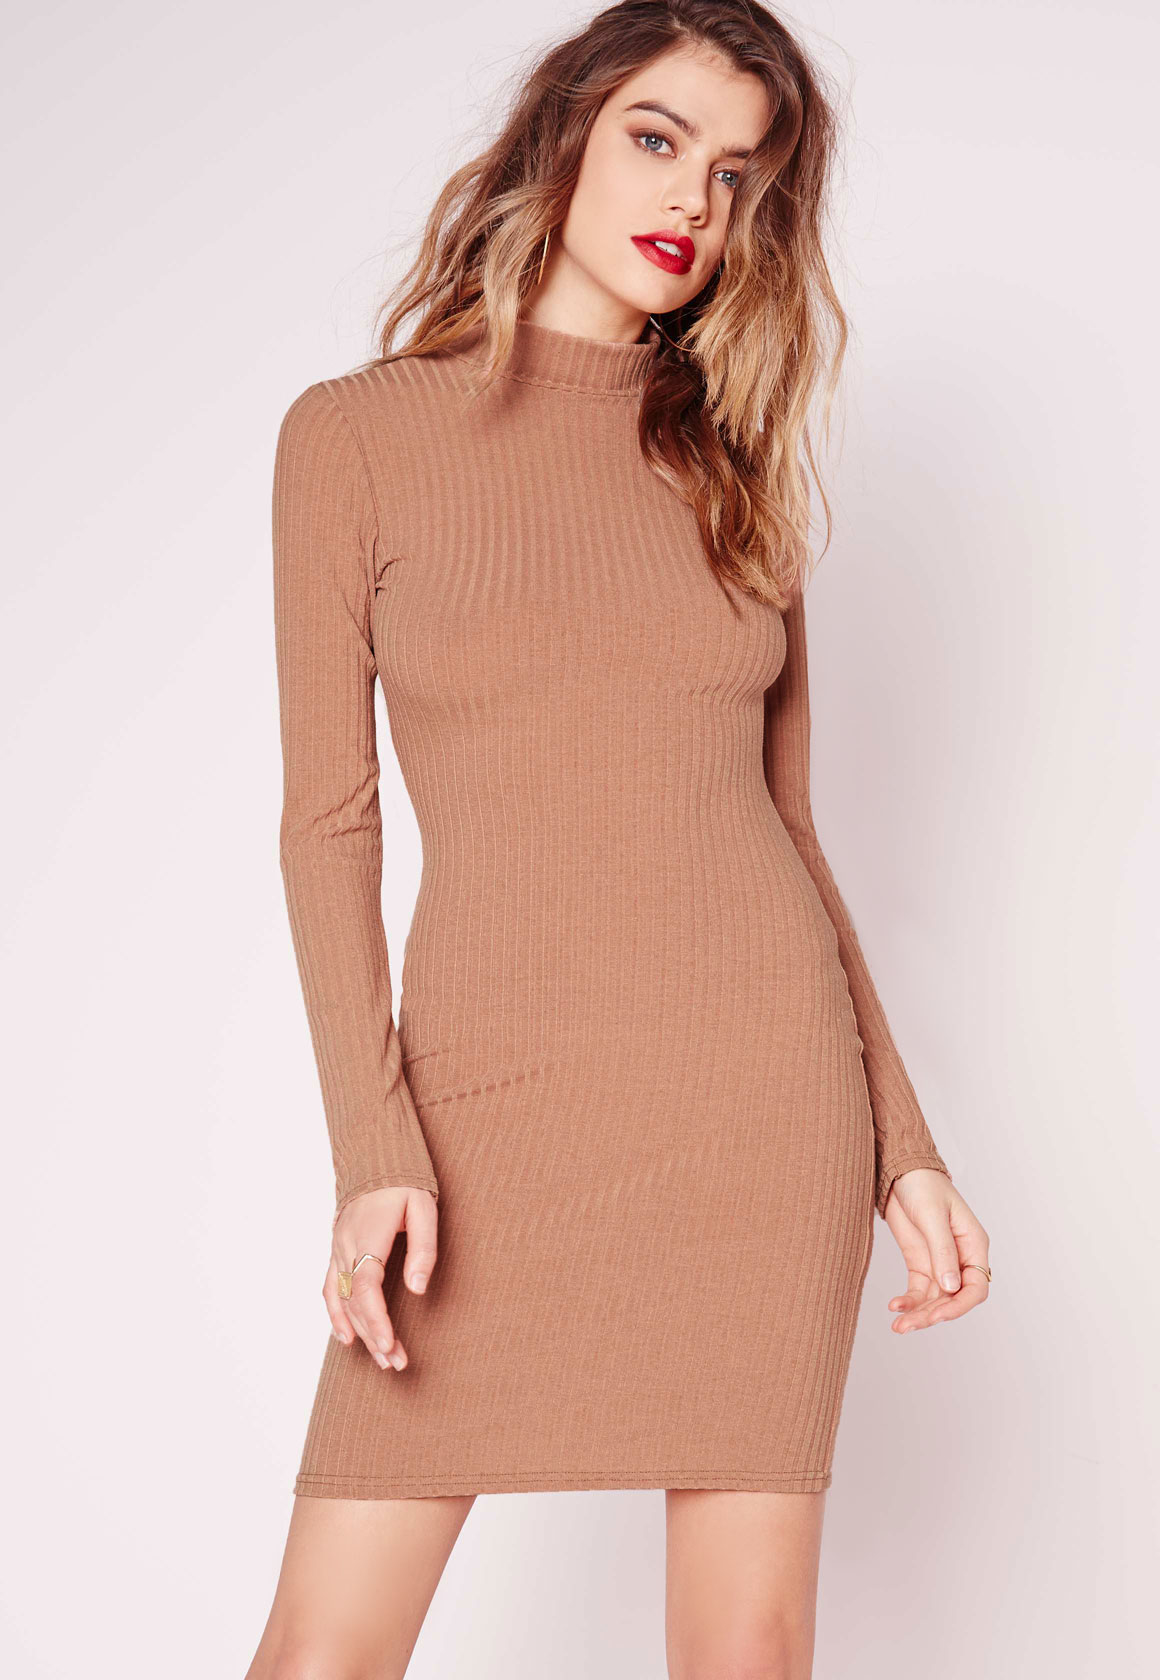 High neck long sleeve bodycon dress online